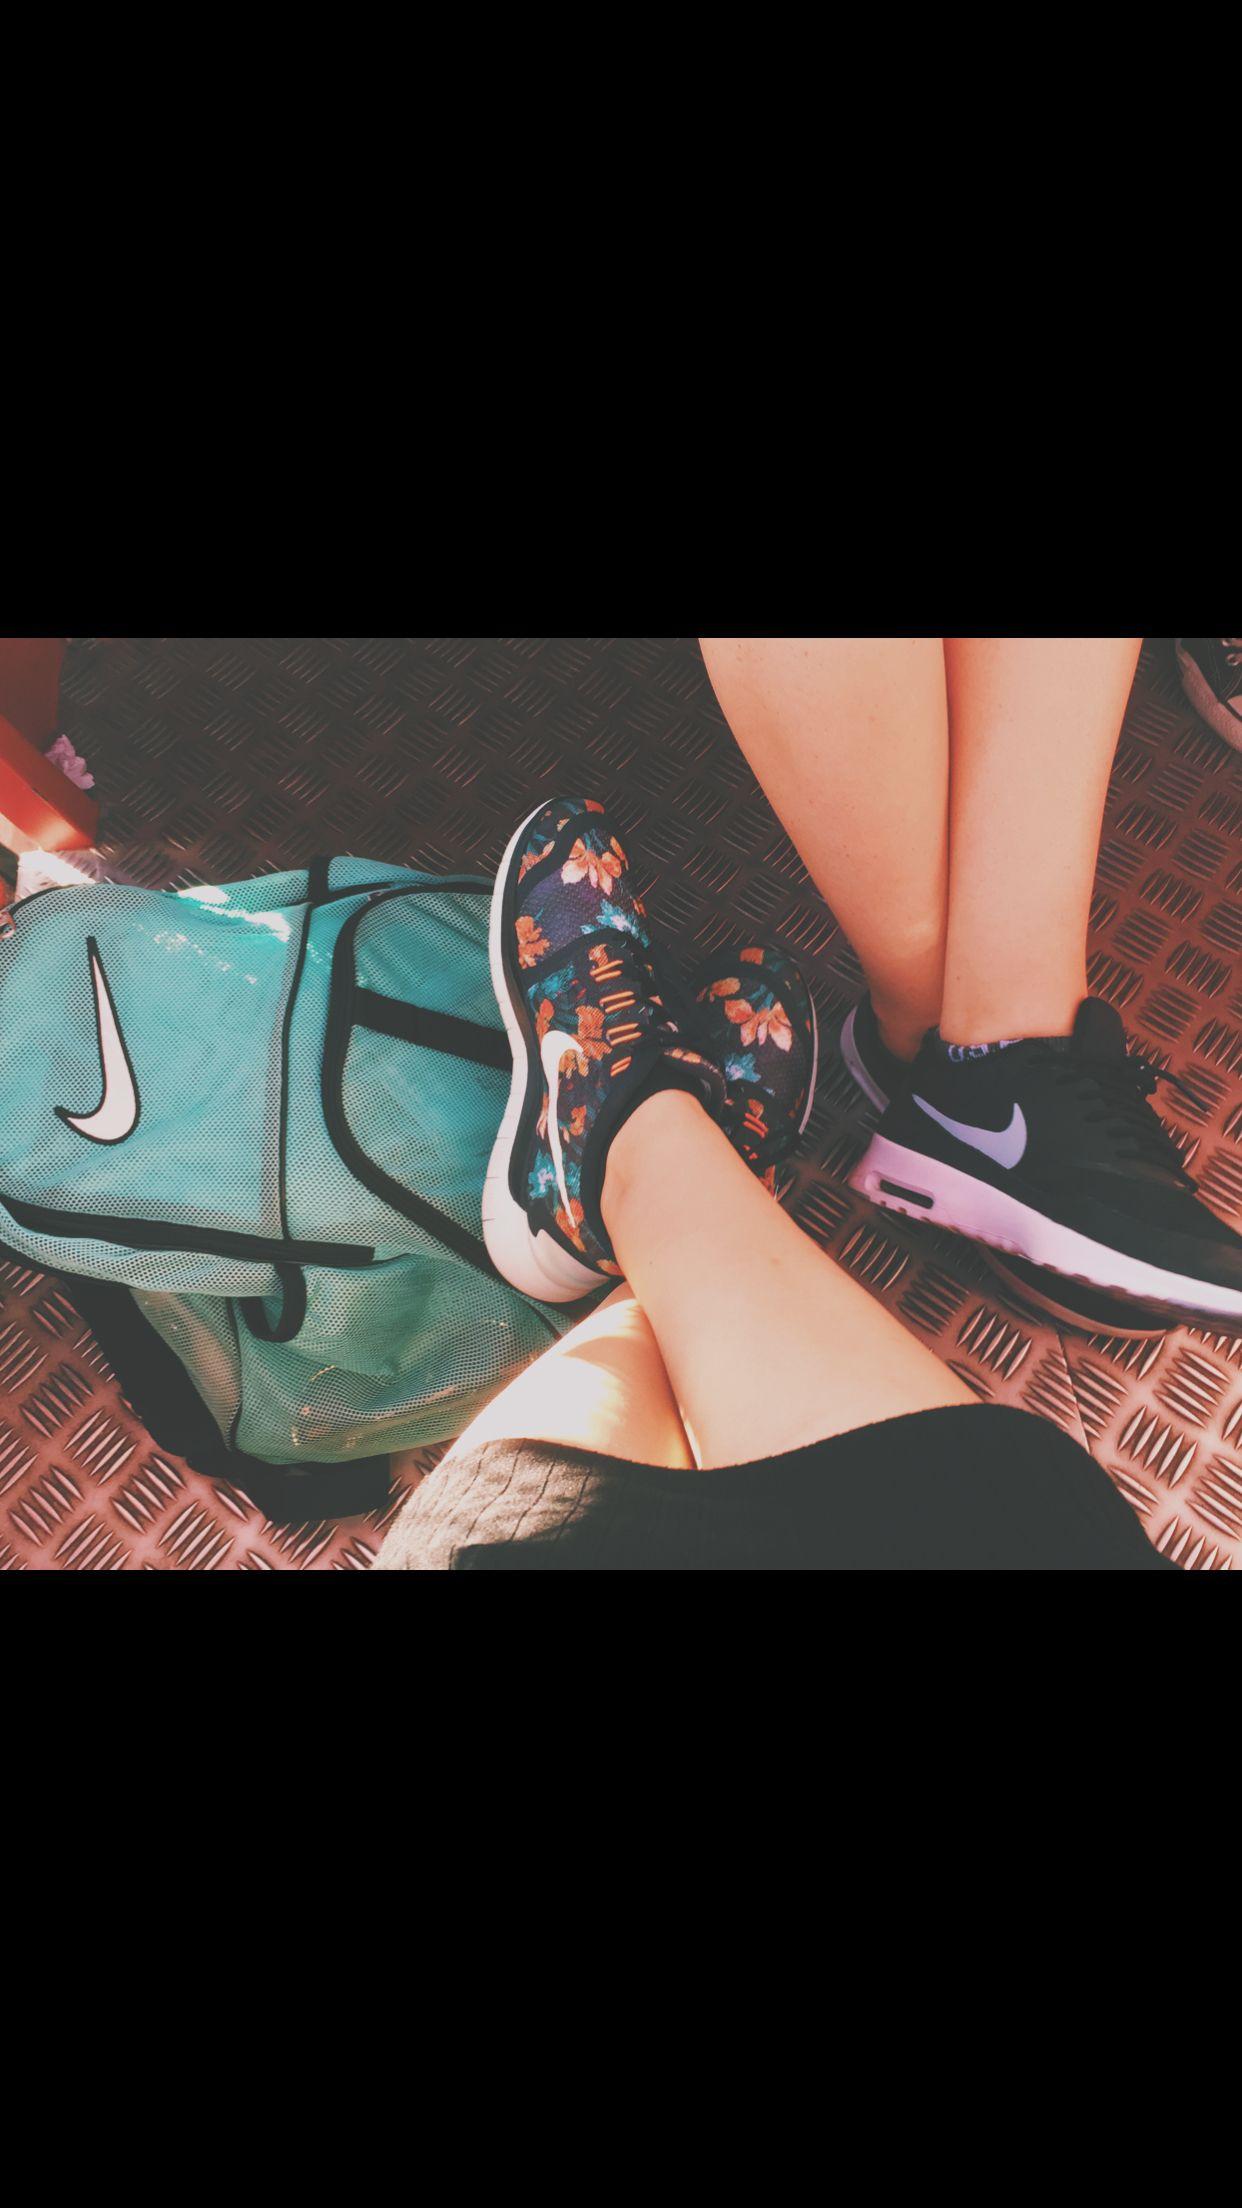 Nikes at Disneyland